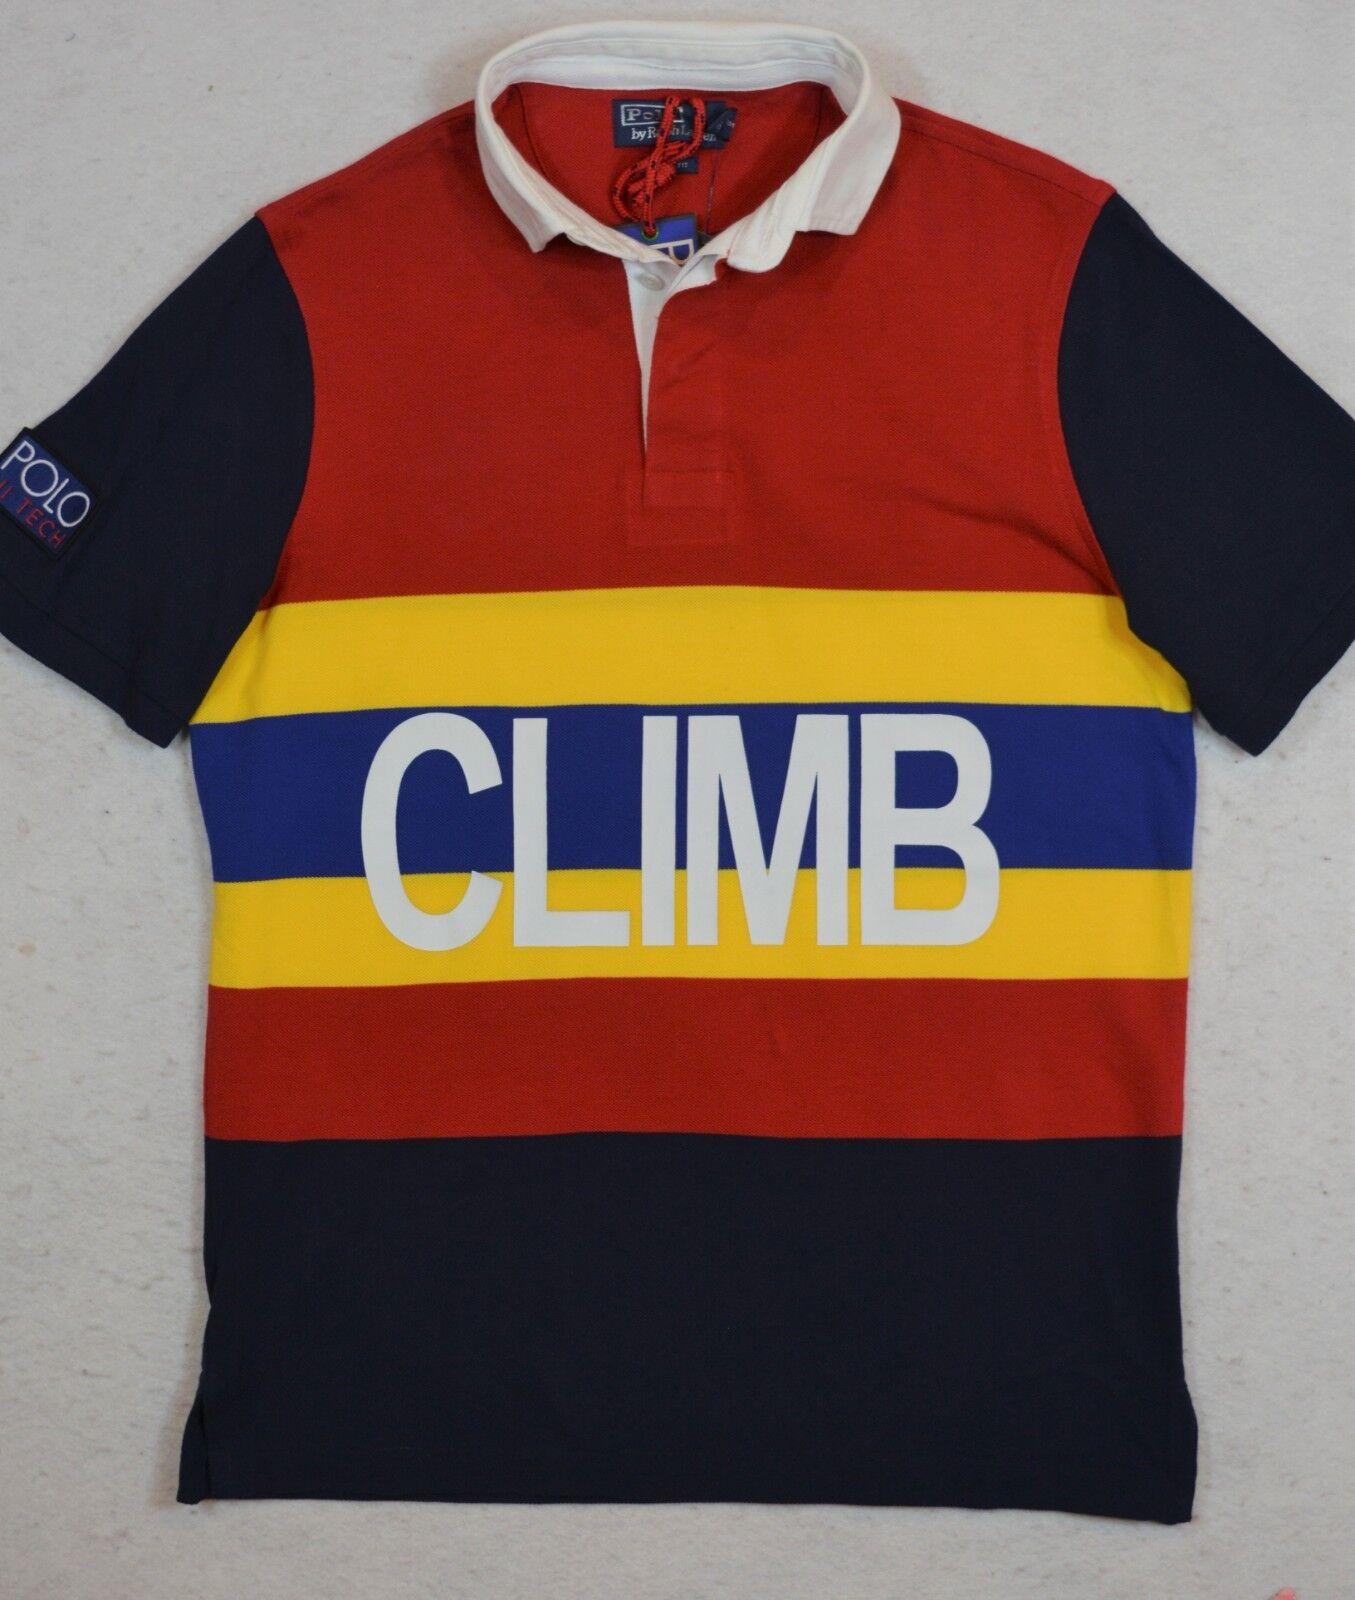 Polo Ralph Lauren Hi Tech CLIMB Mesh Rugby Classic Fit Shirt L XL NWT